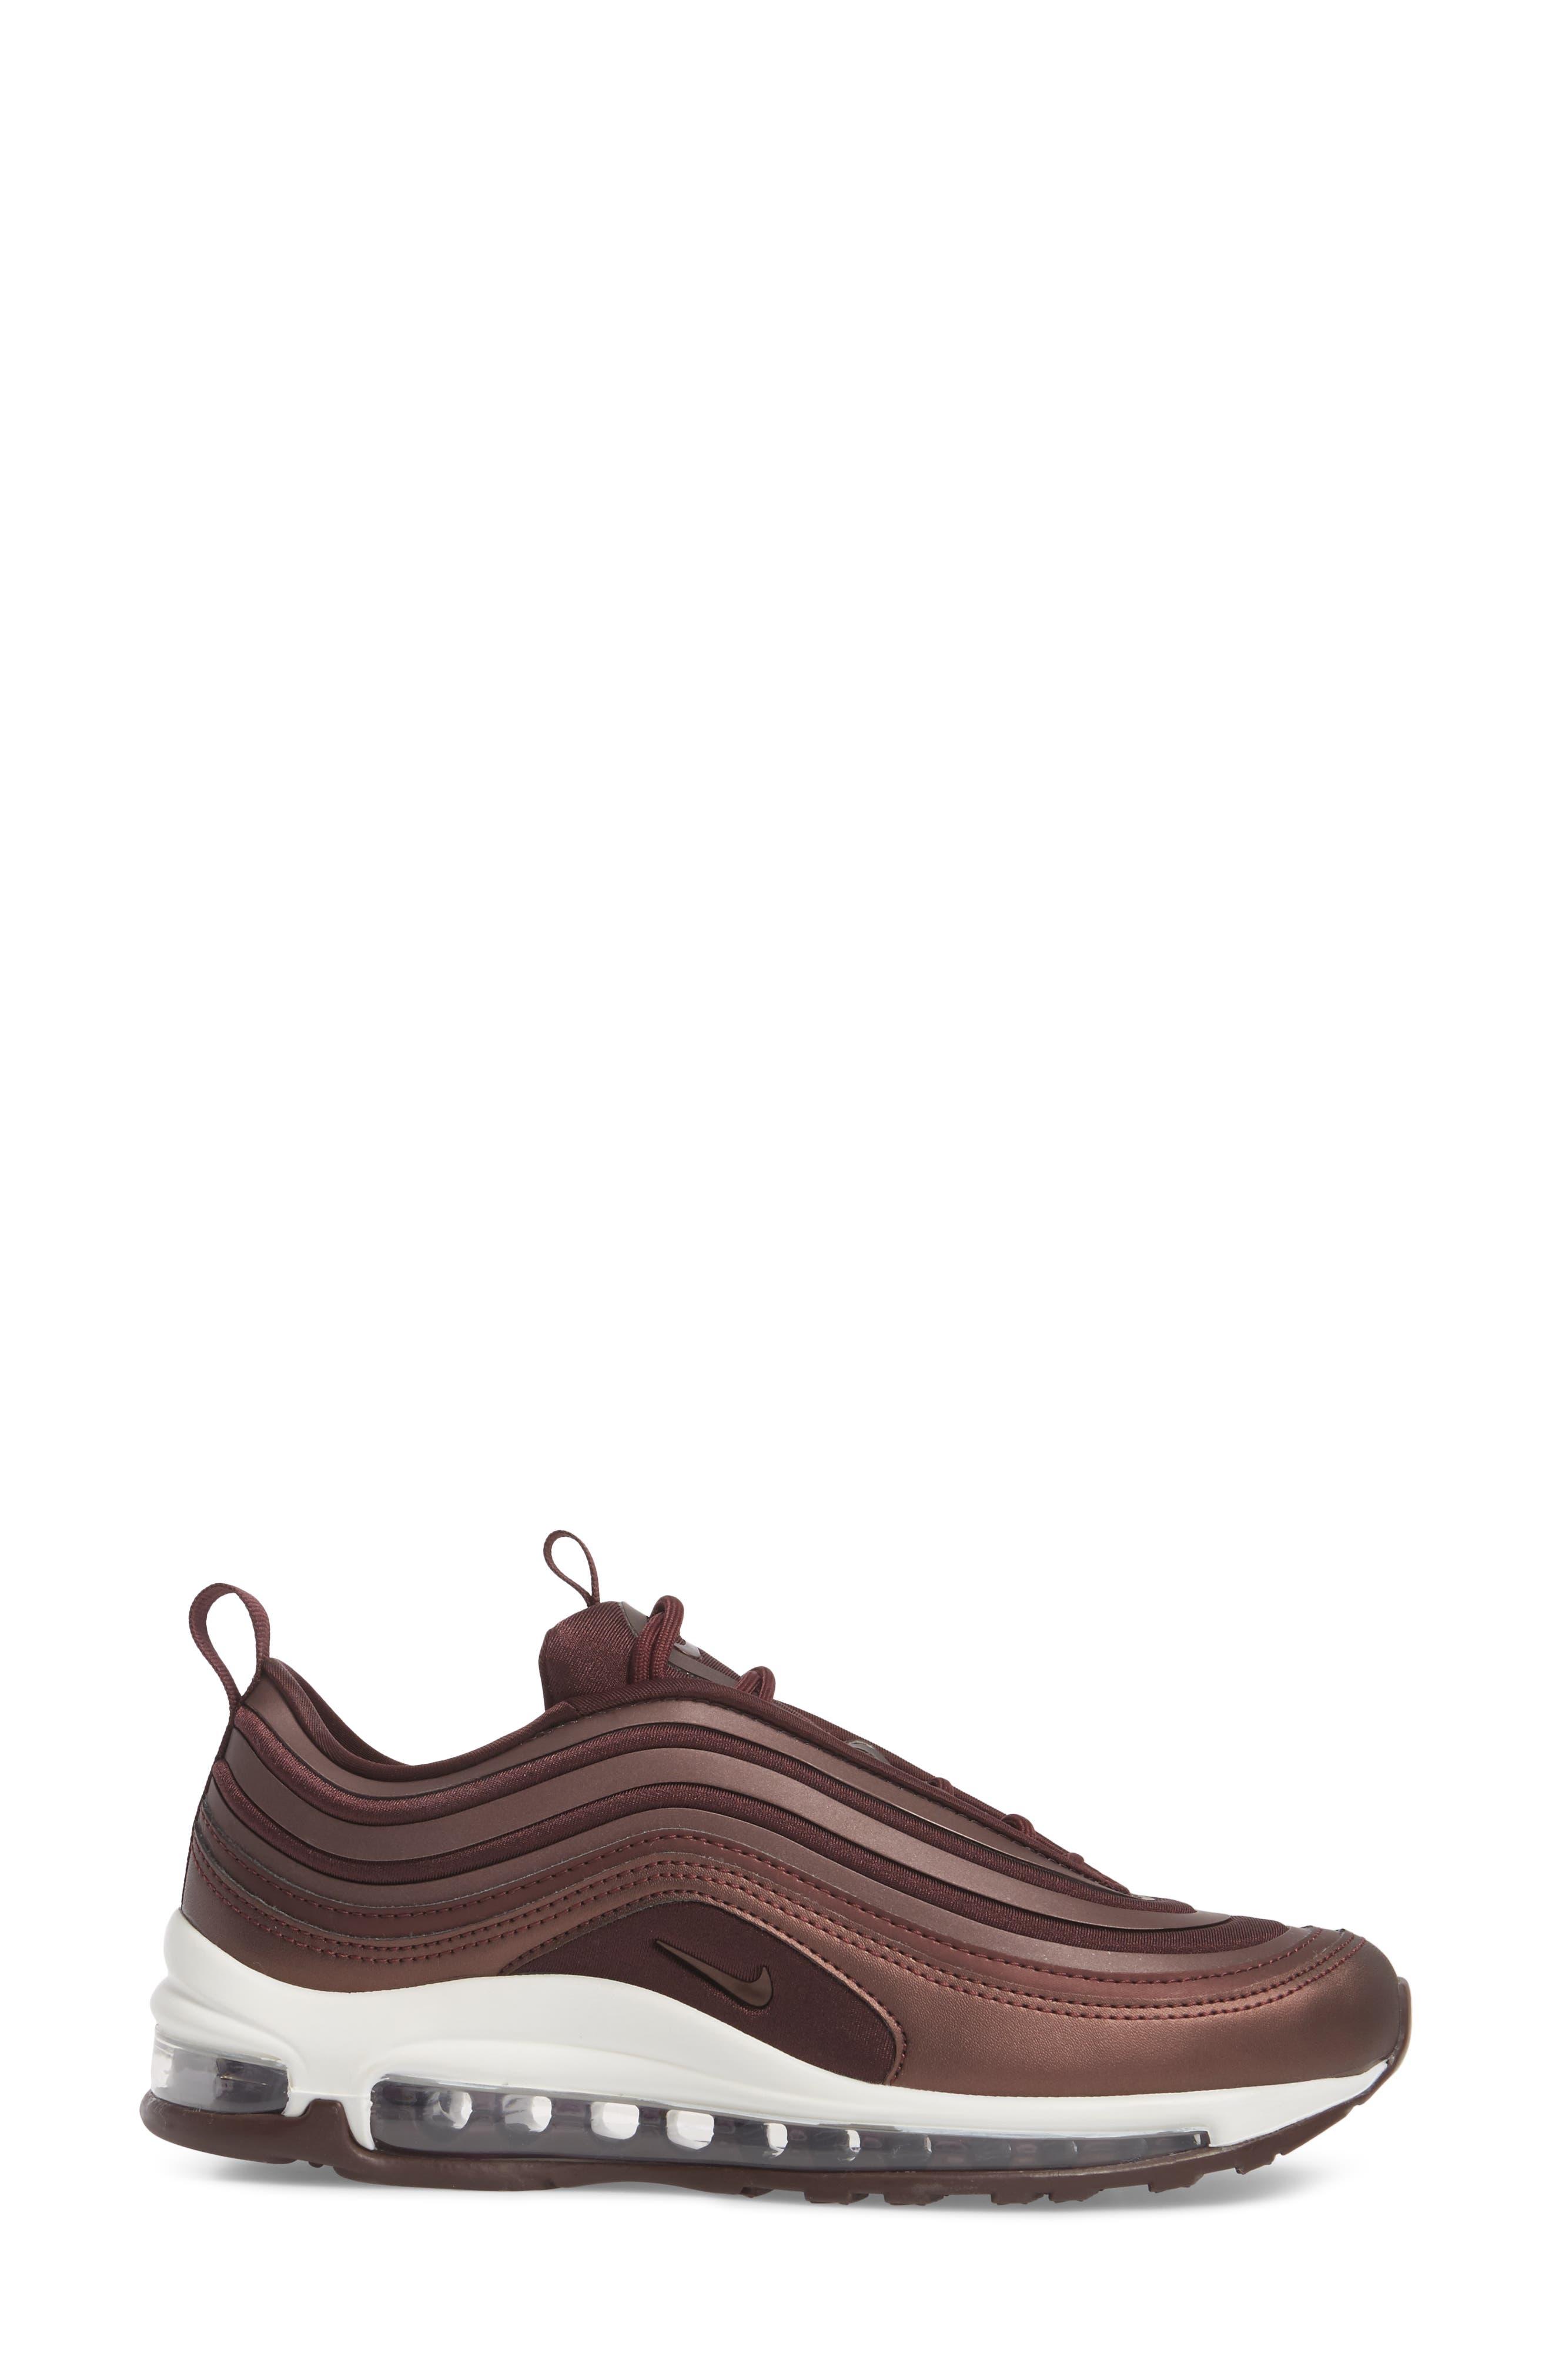 Air Max 97 Ultralight 2017 Sneaker,                             Alternate thumbnail 26, color,